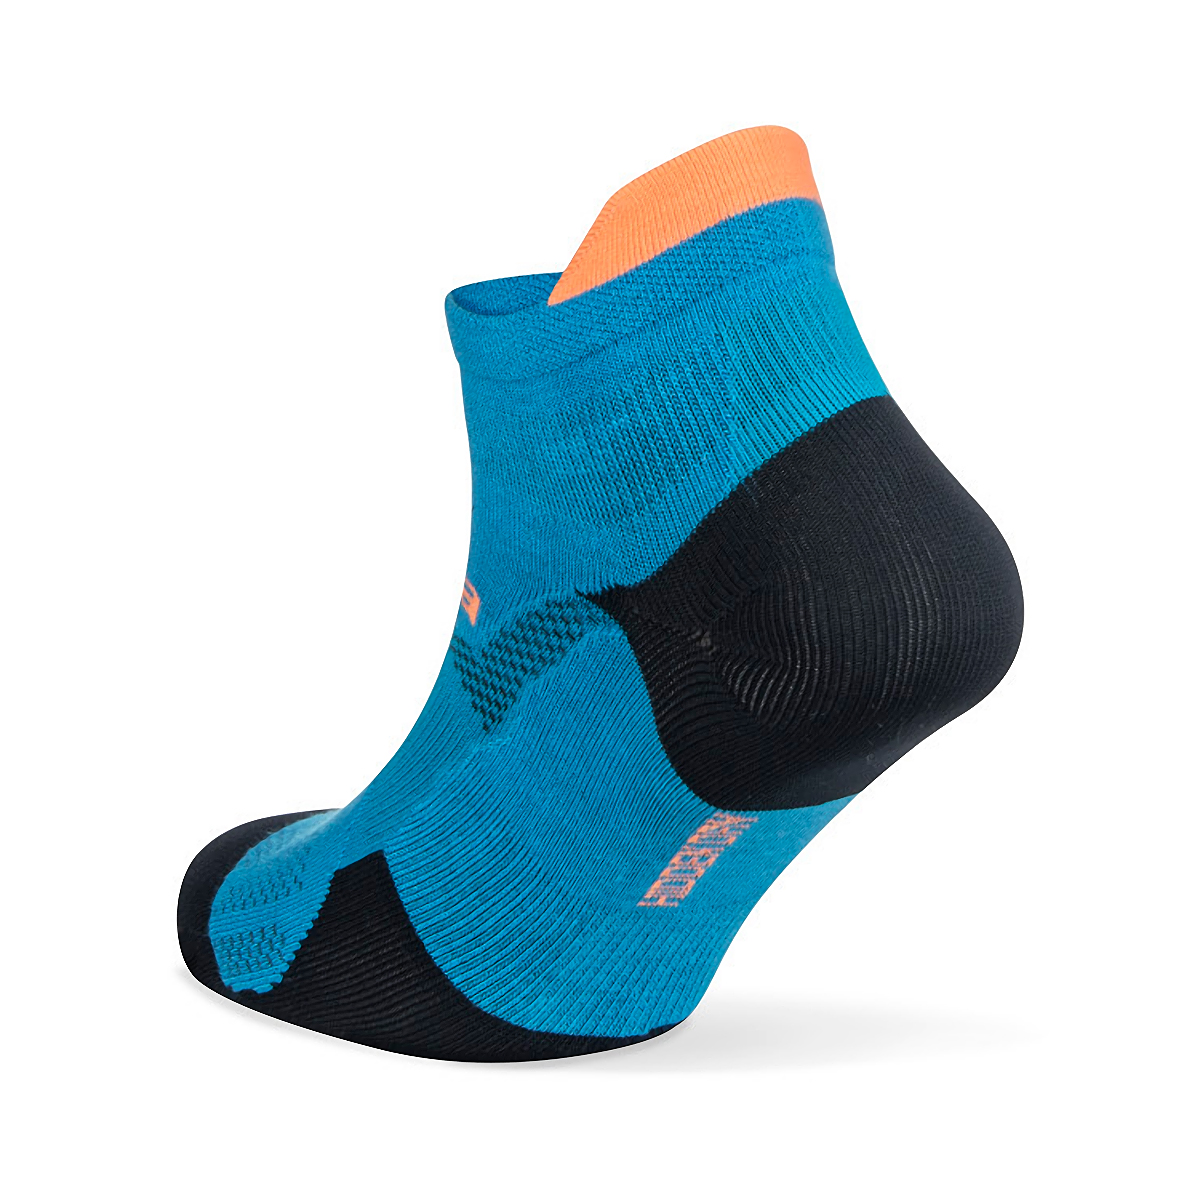 Balega Hidden Dry No Show Socks - Color: Bright Turquoise/Navy - Size: S, Bright Turquoise/Navy, large, image 3